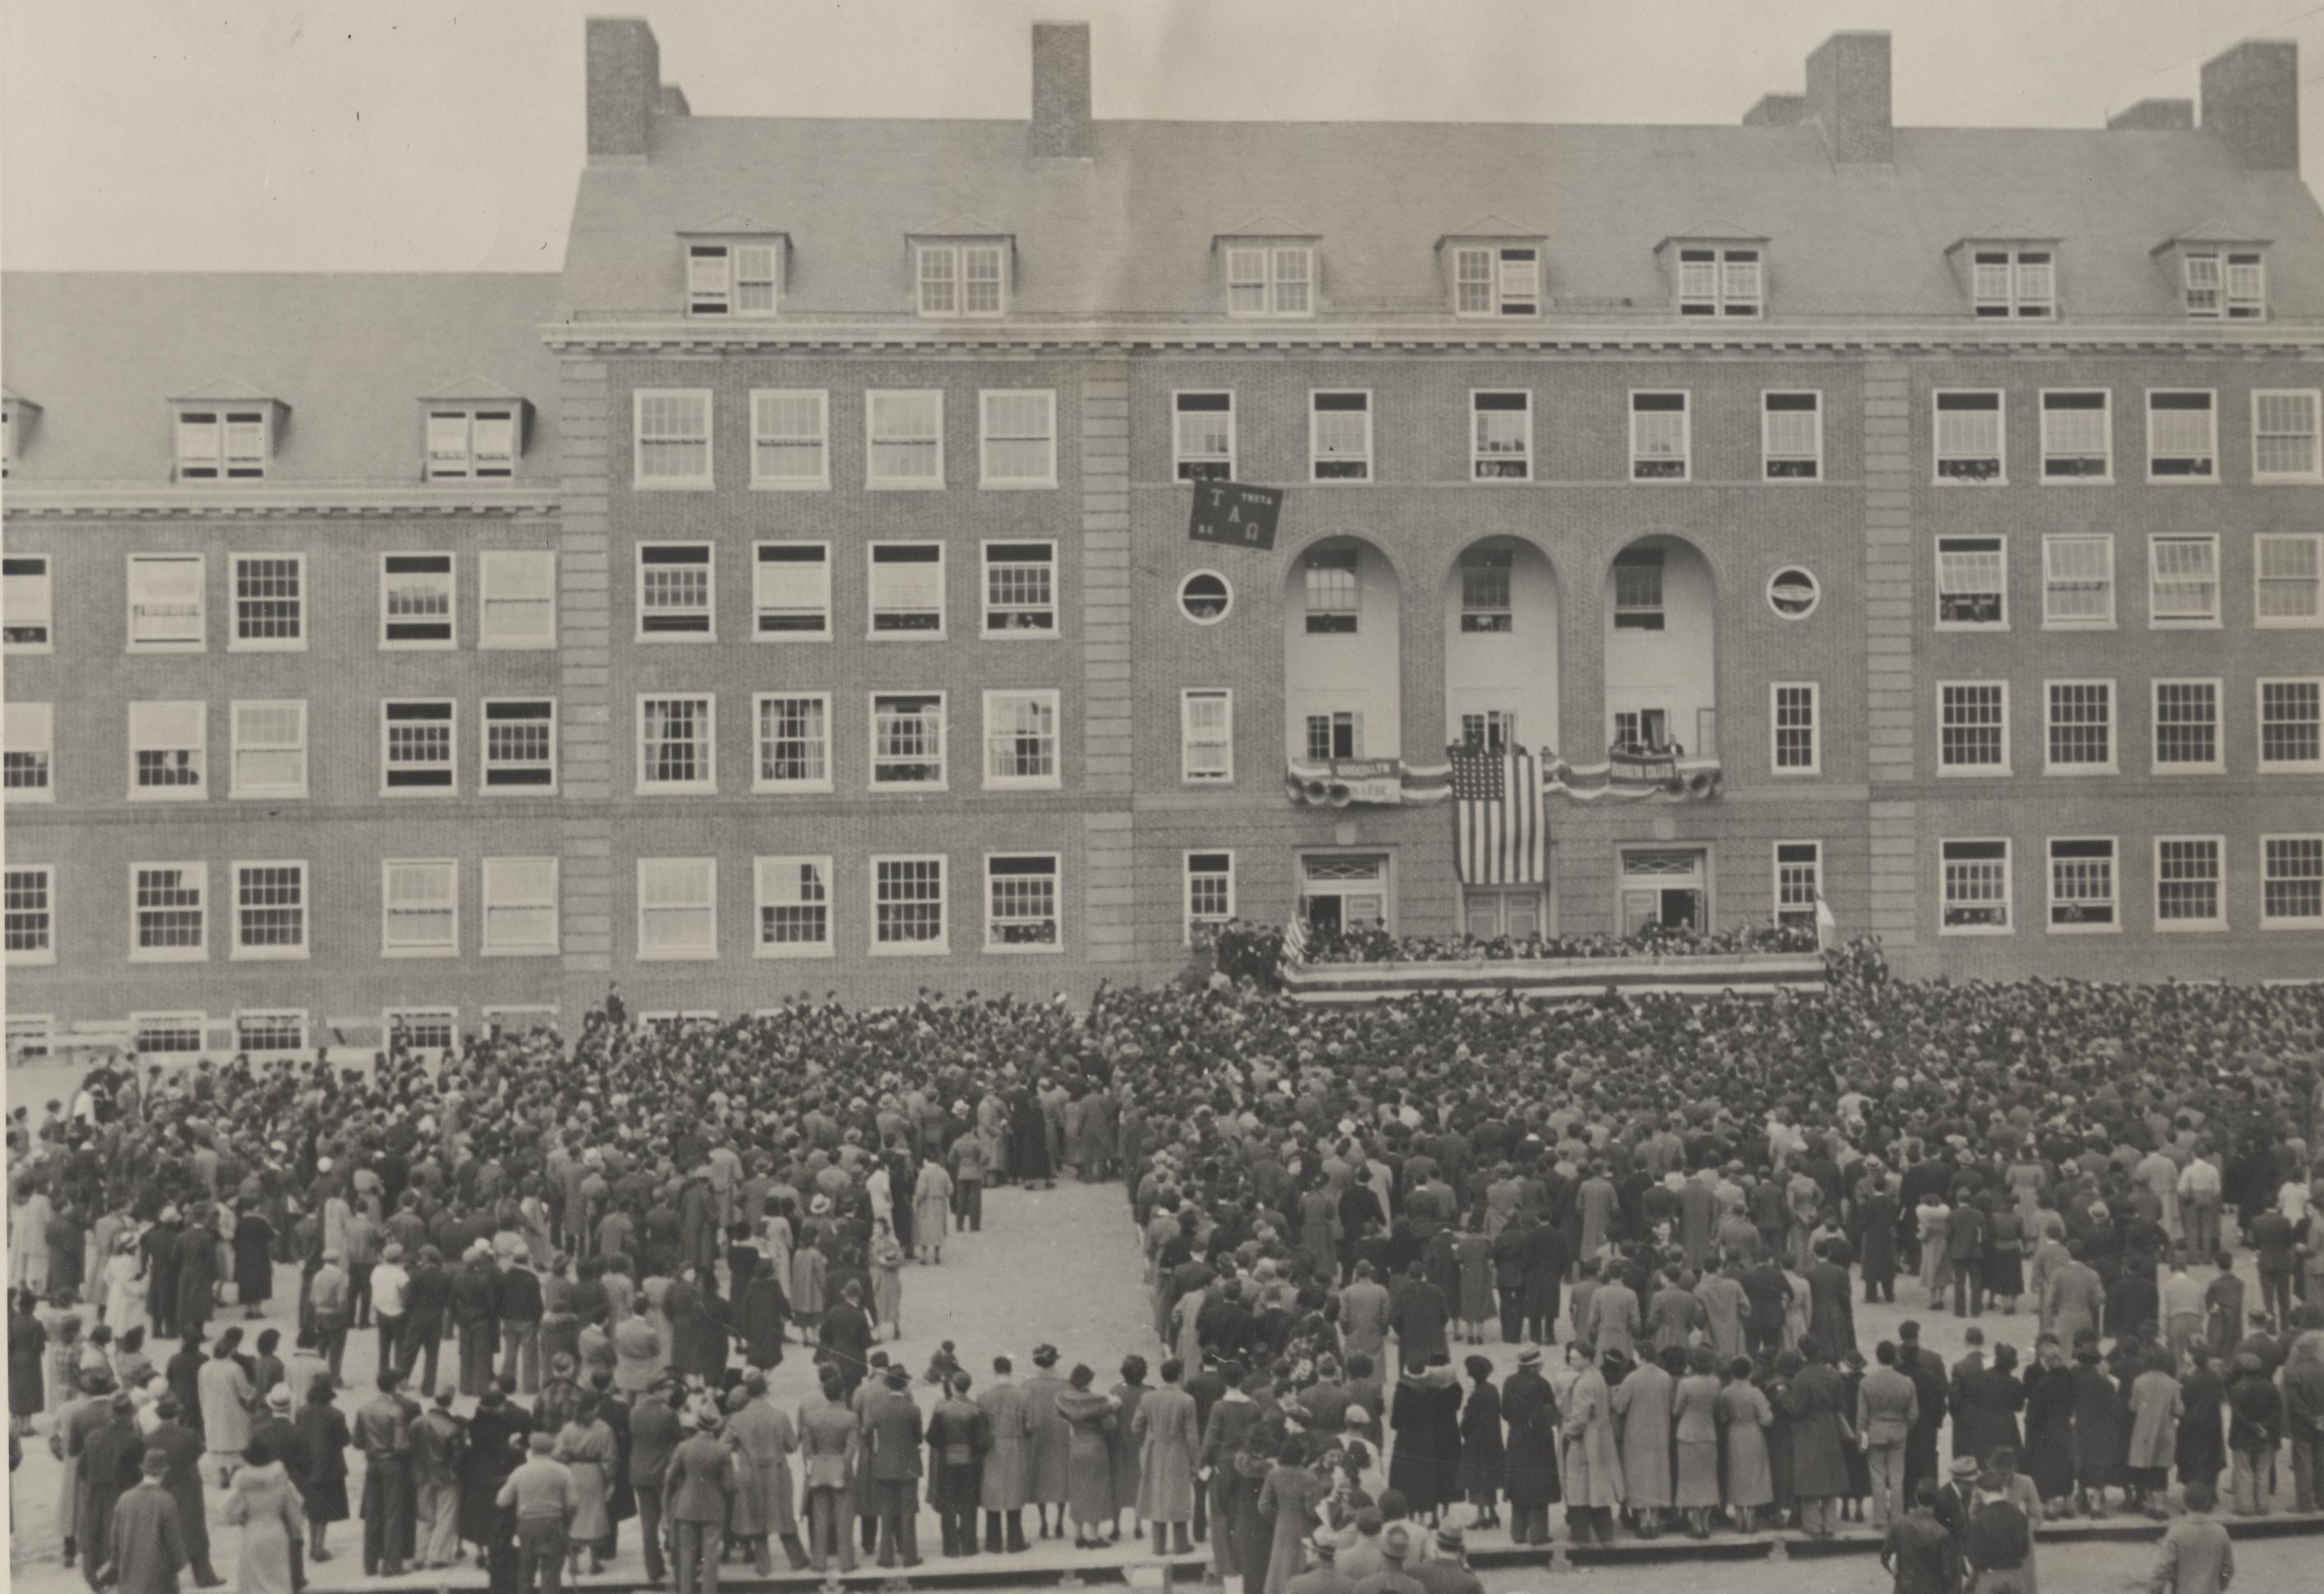 Midwood Campus Dedication Ceremonies, 1936.